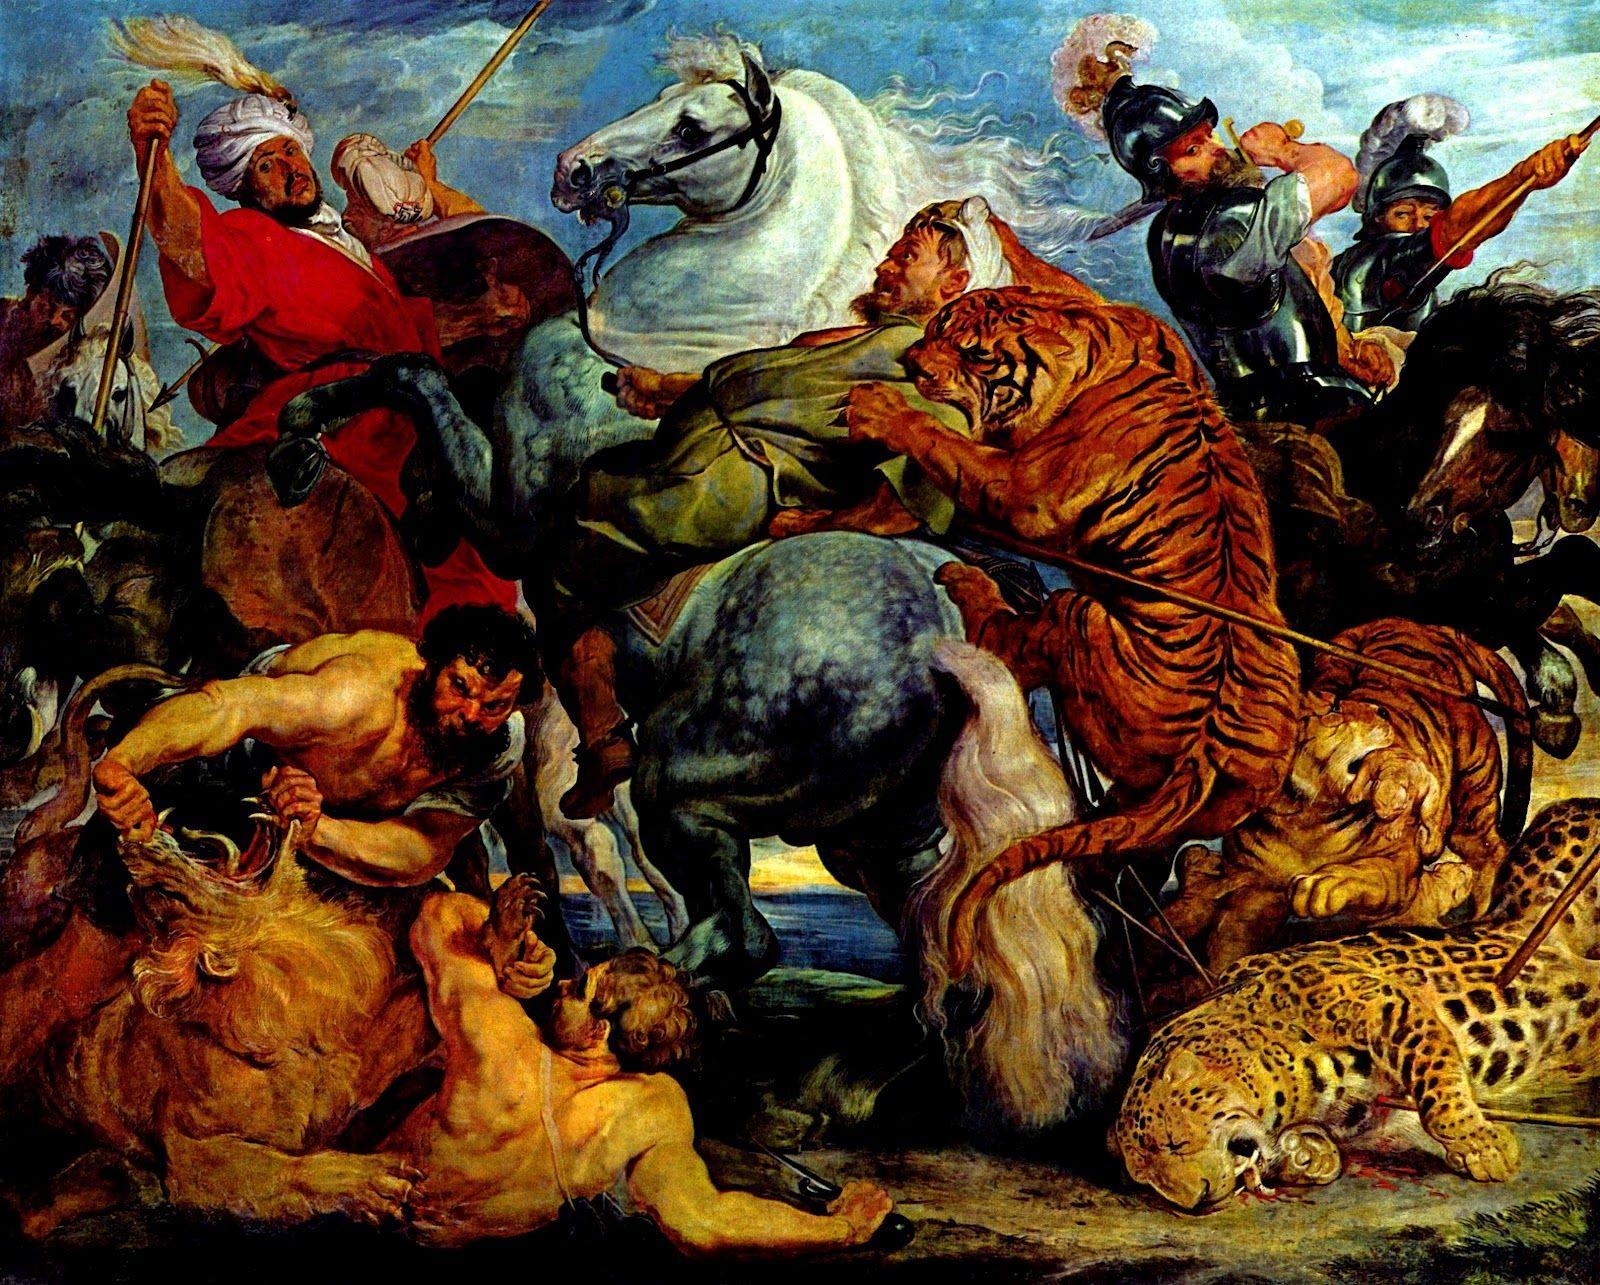 Characteristics of Baroque Art   Rubens paintings, Peter paul rubens, Baroque art